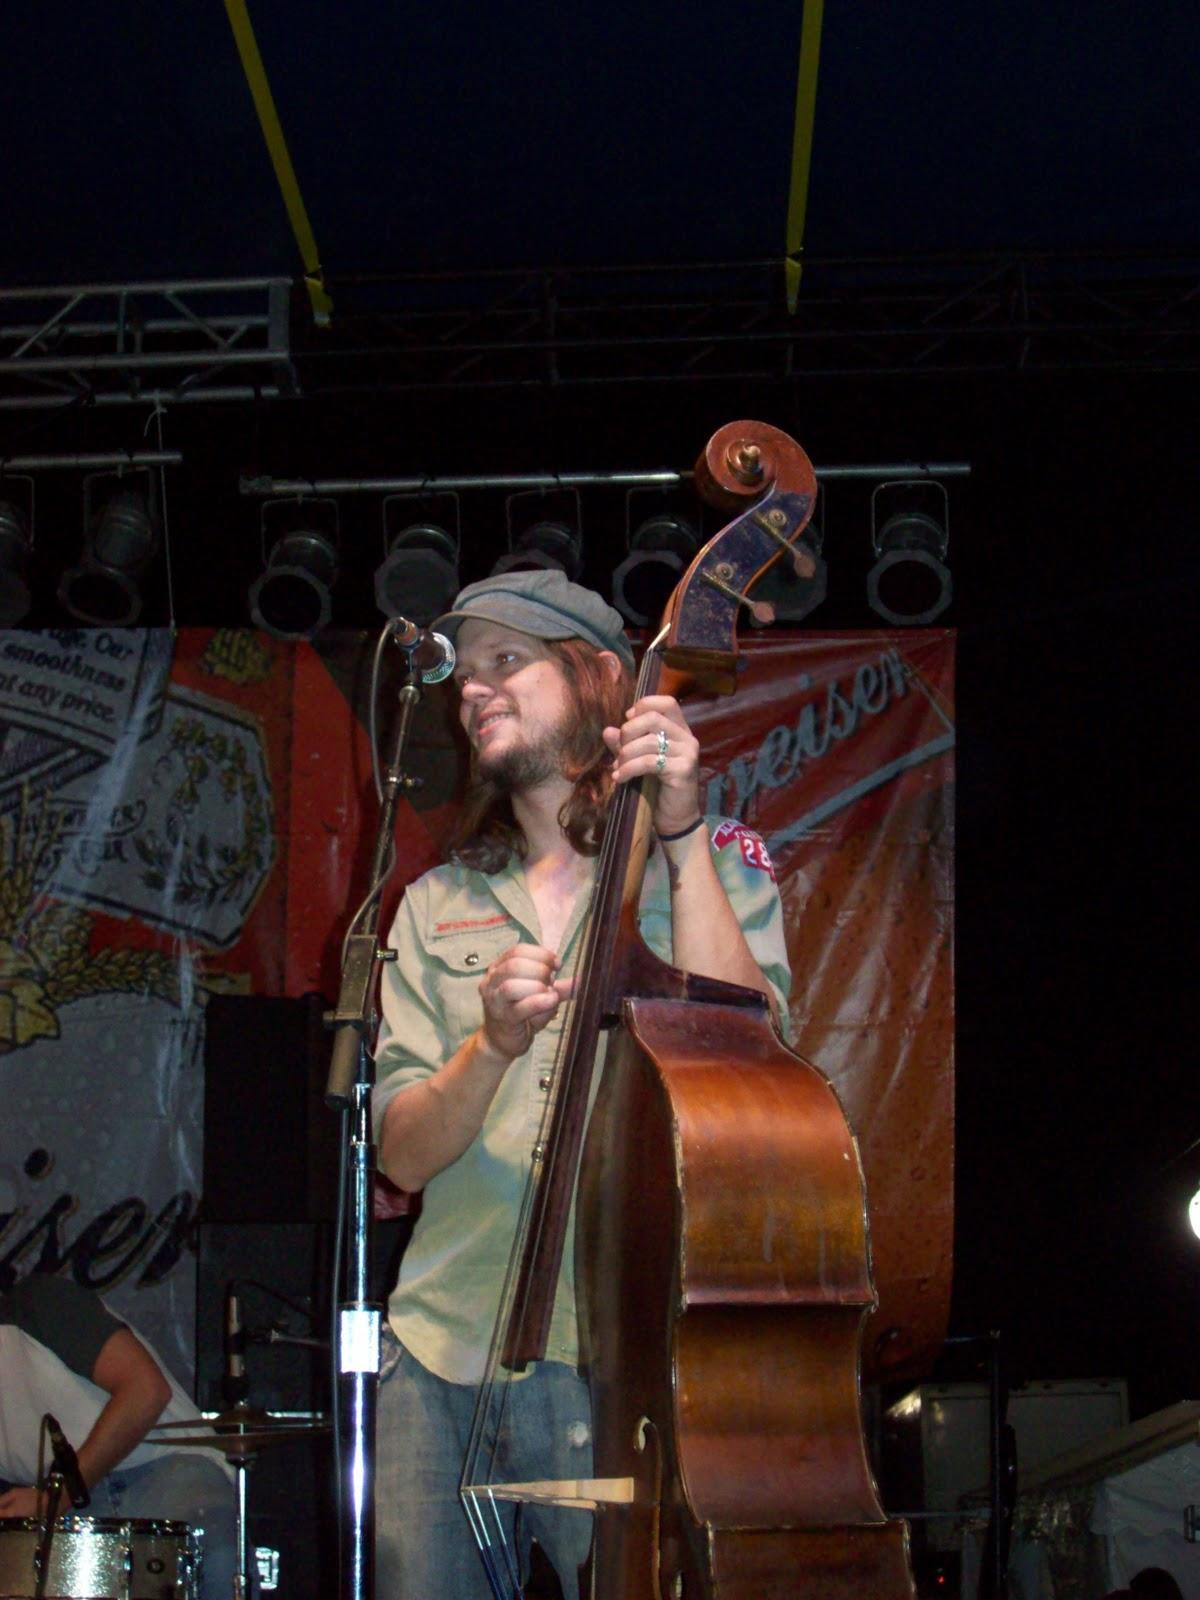 Conroe Cajun Catfish Festival - 101_0641.JPG